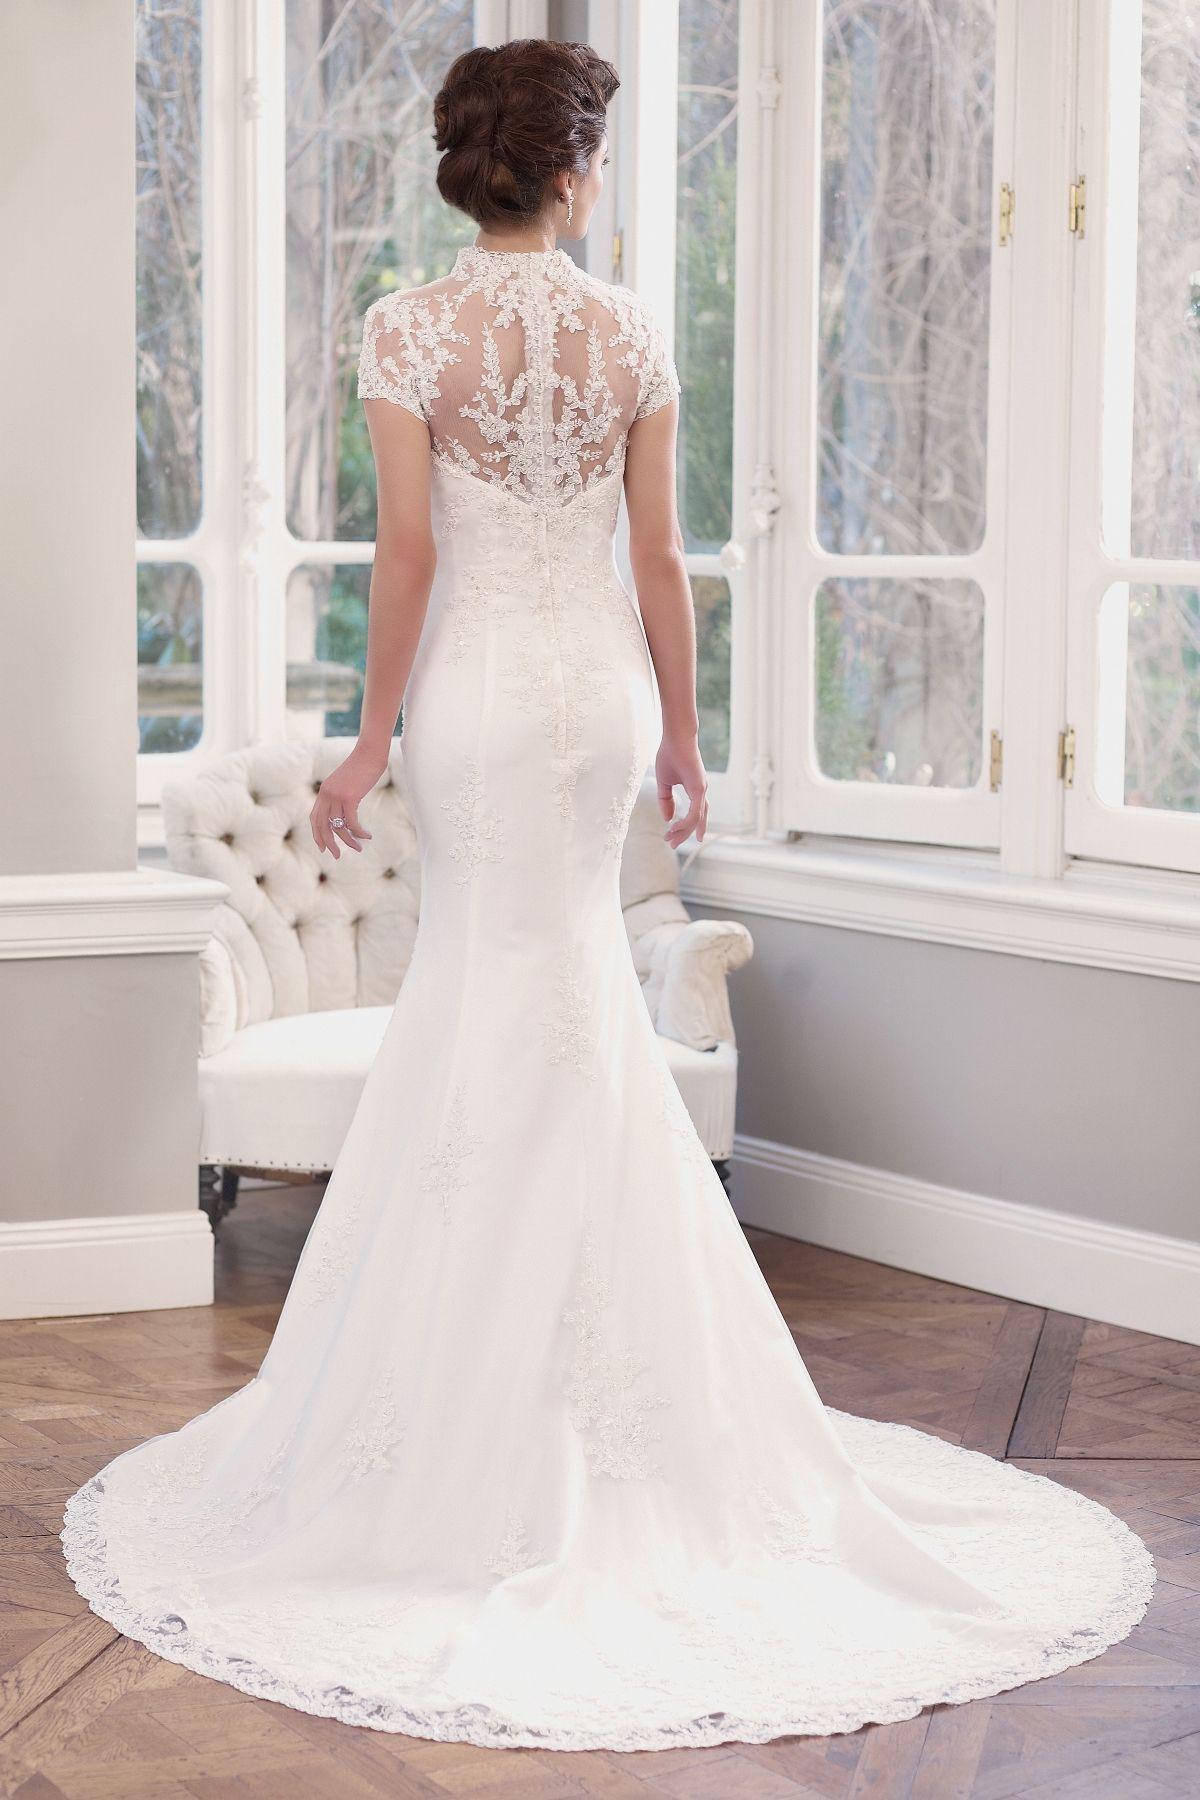 Lace cap sleeve a line wedding dress  MZ  Lace slim Aline wedding dress with Queen Anne neckline